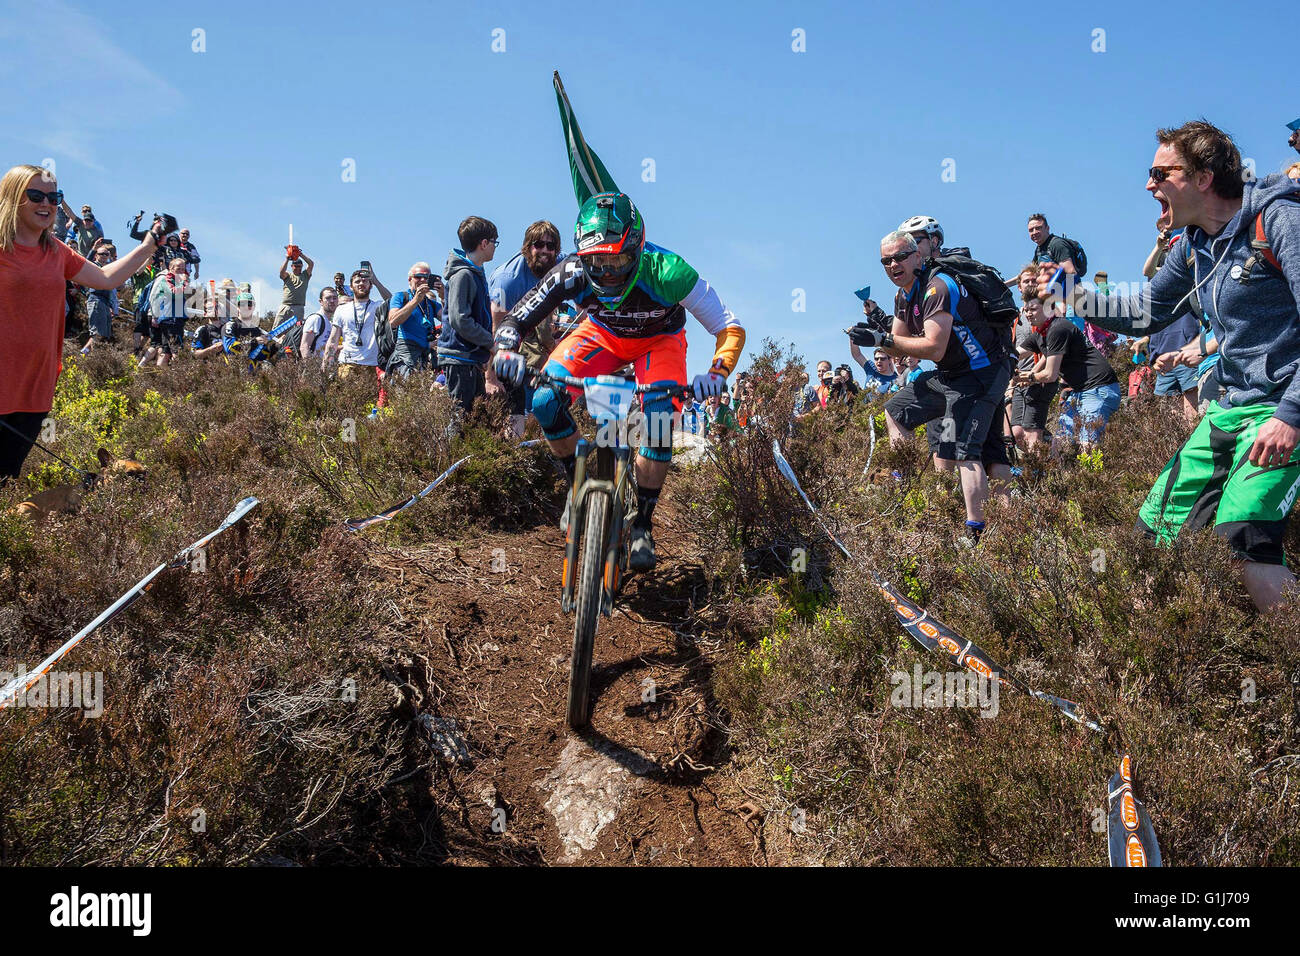 Carrick Mountain, Co Wicklow, Ireland. 15th May, 2016. Emerald Enduro World Series mountain bike downhill racing - Stock Image